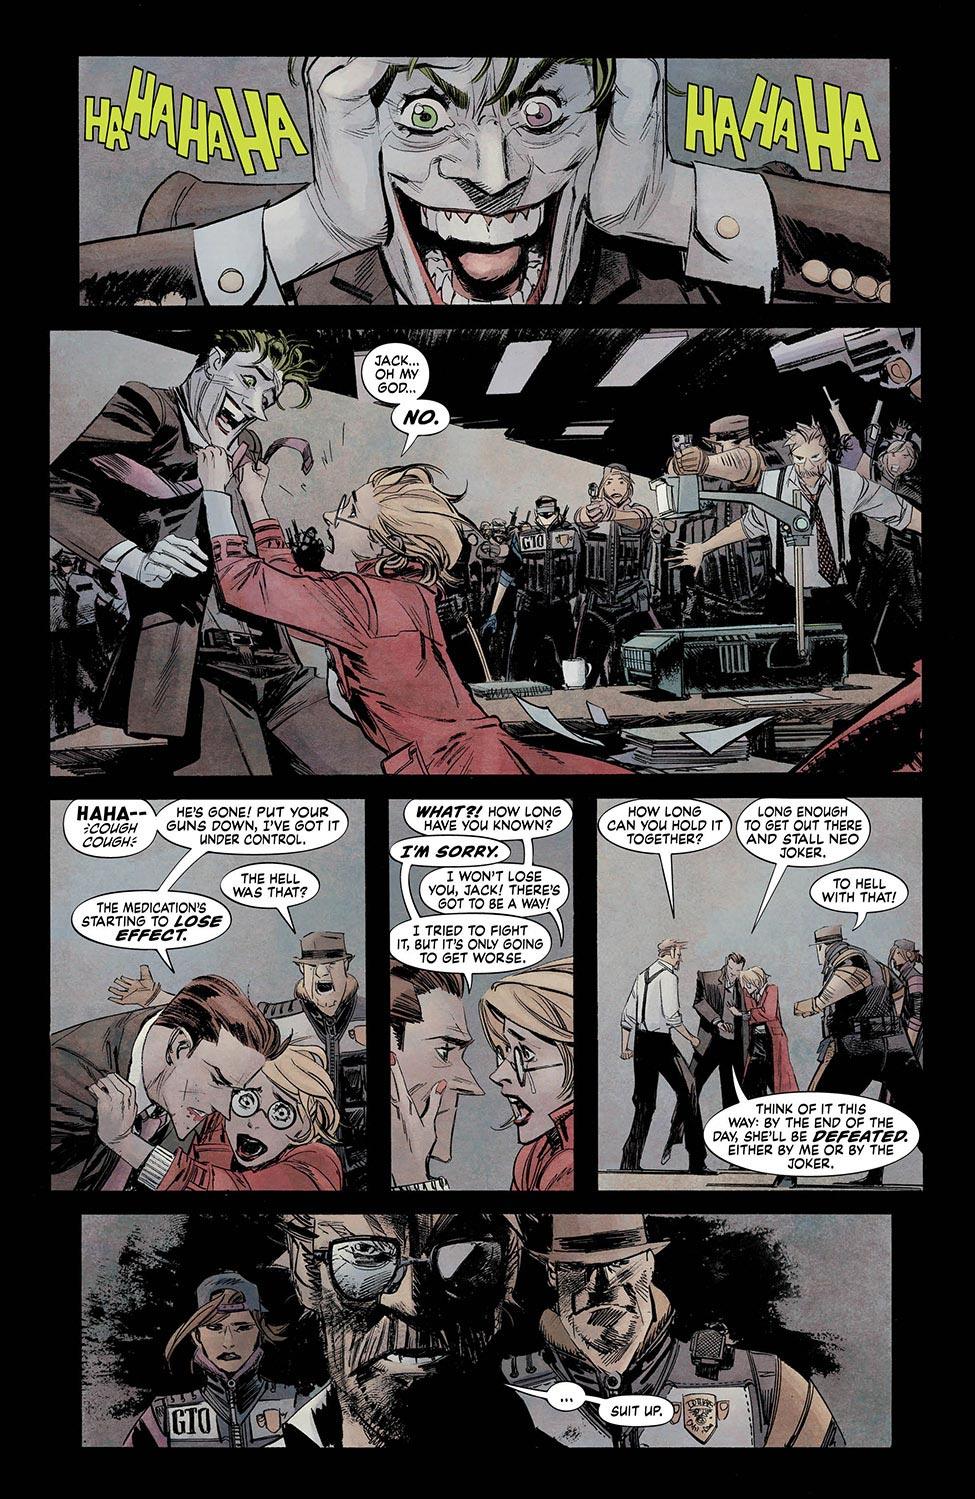 Batman White Knight 7_1 - DC Comics News